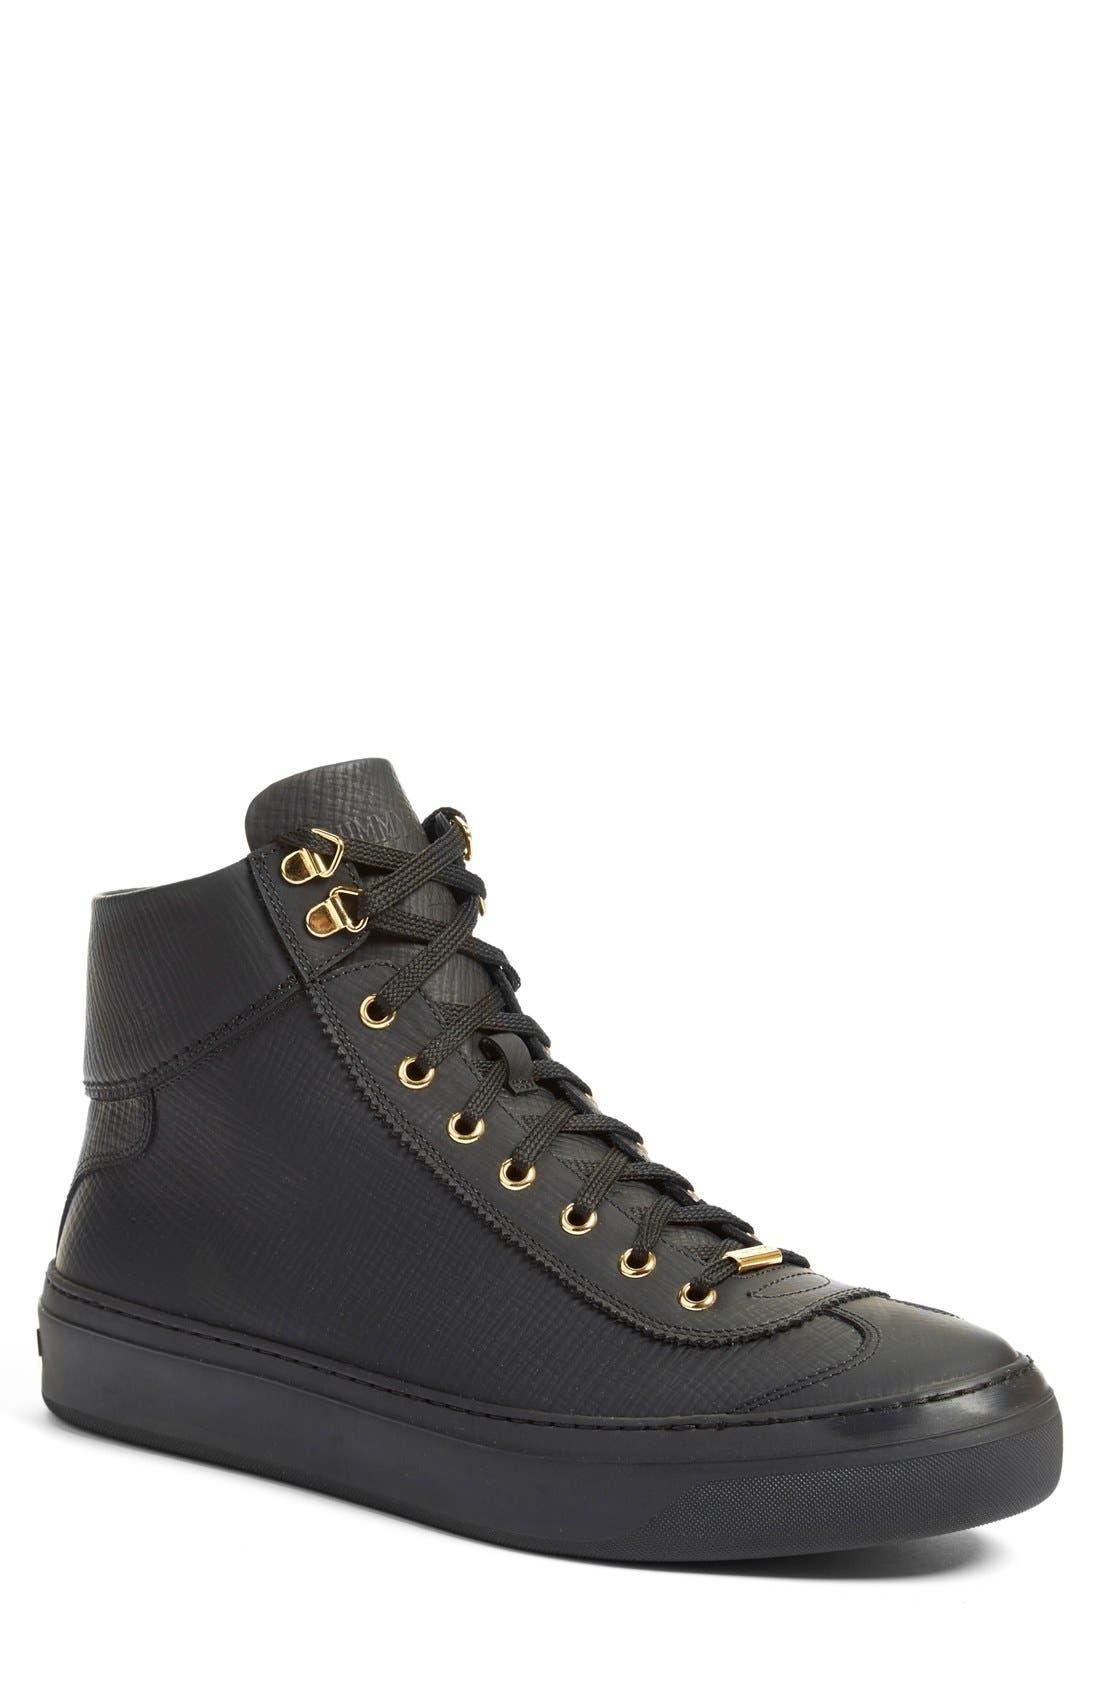 Jimmy Choo 'Argyle' High Top Sneaker (Men)